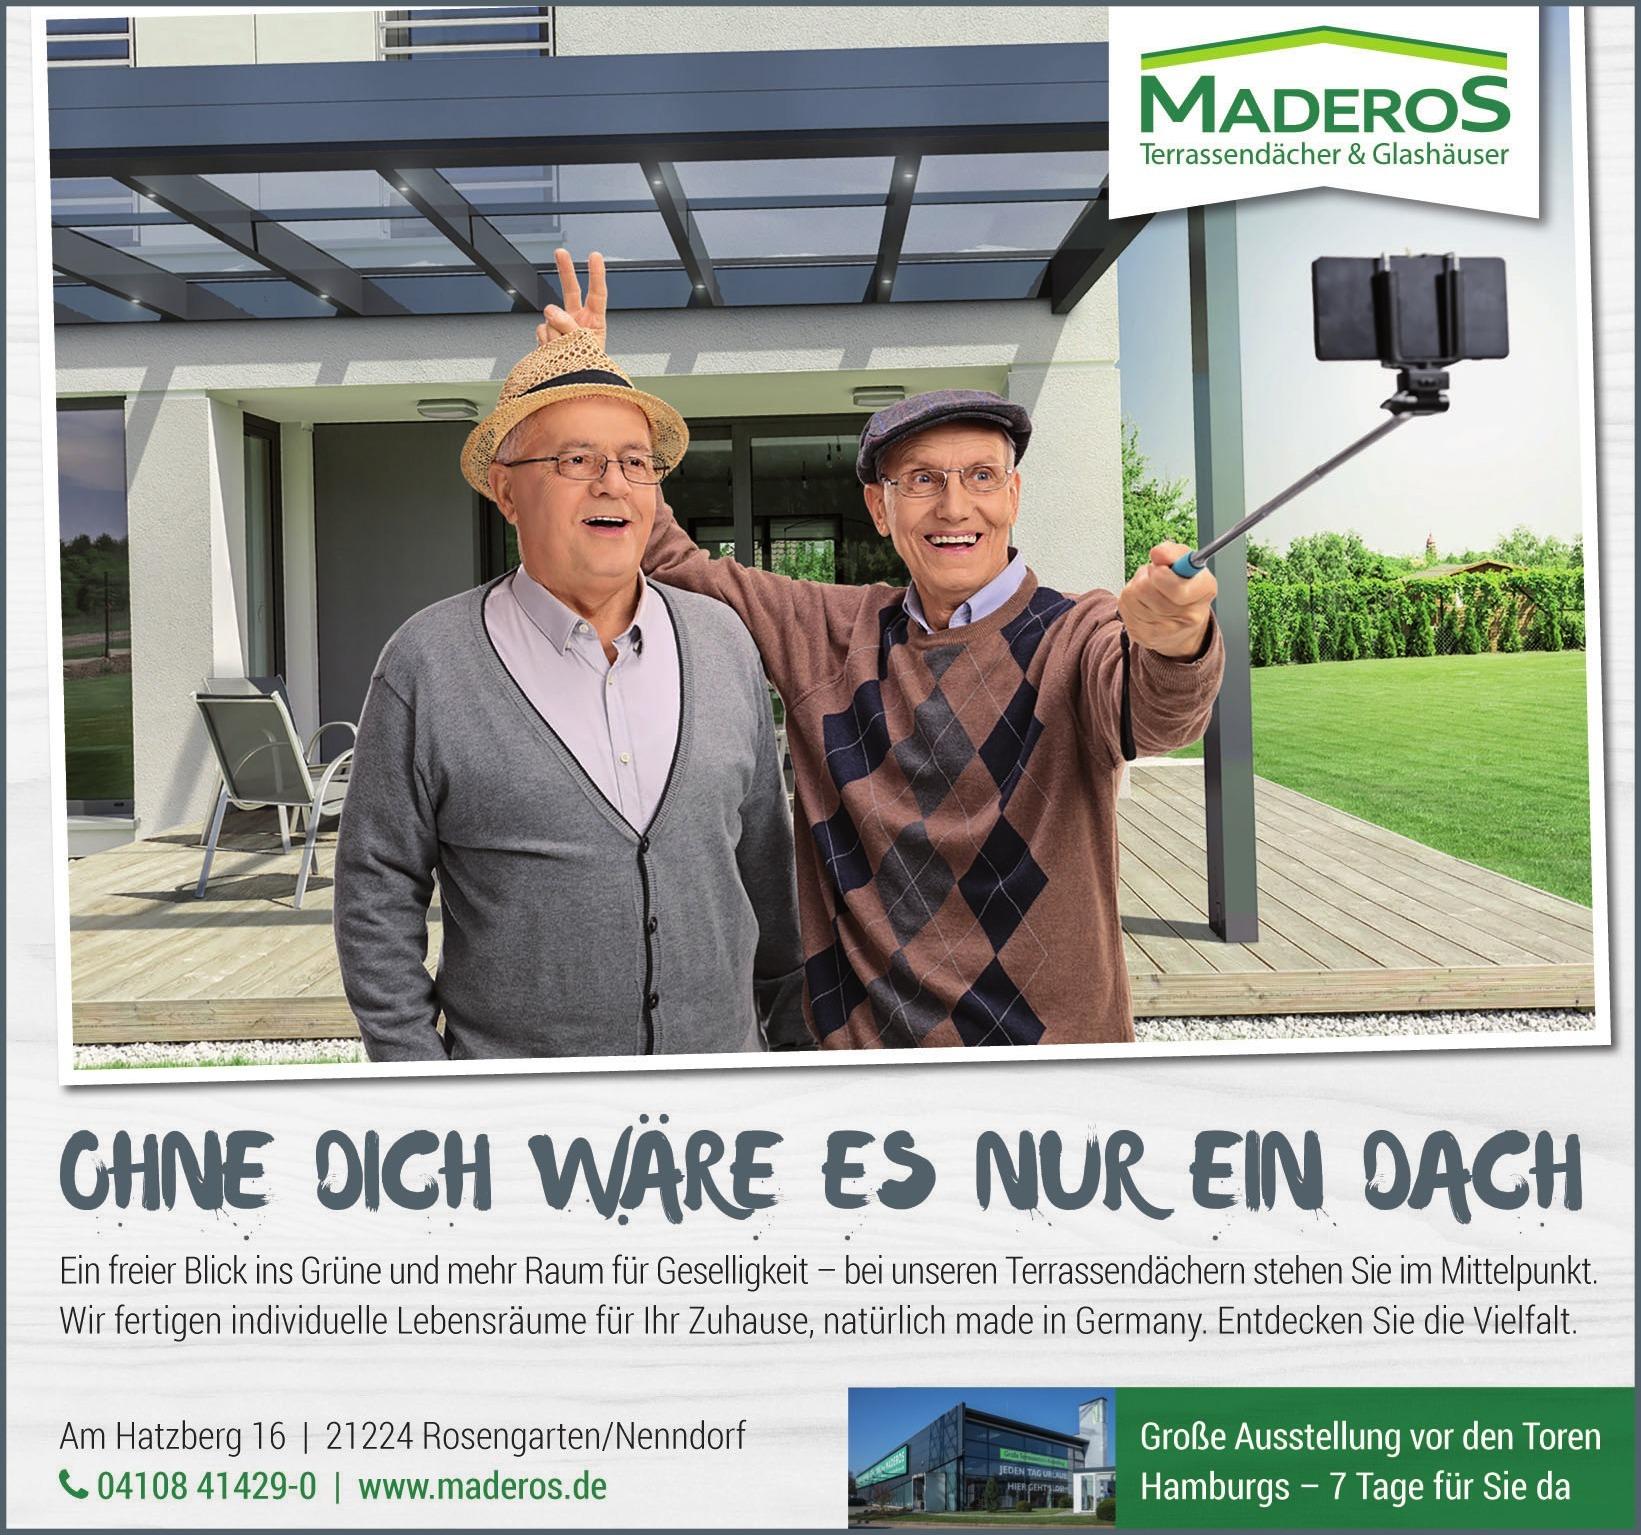 MADEROS GmbH